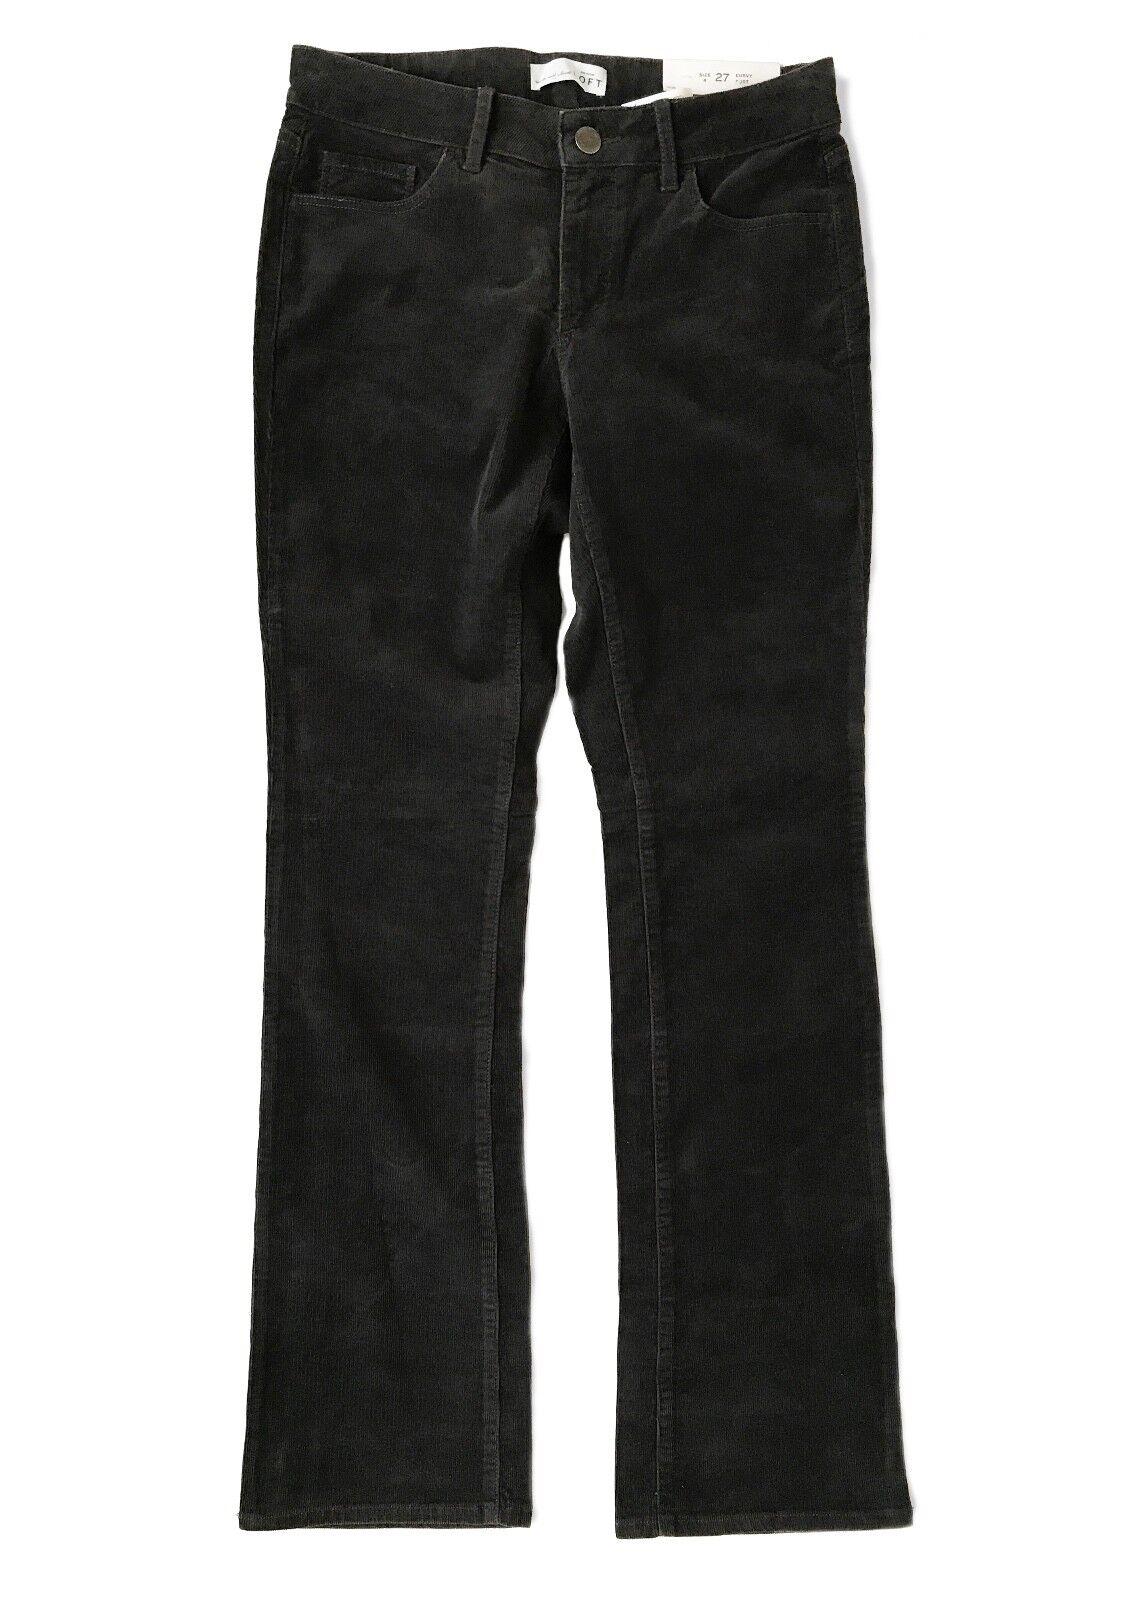 Loft - Damen 4 Hoch (4T) - Nwt - Kohle Grau Kurvige Stiefelcut Cord Hose